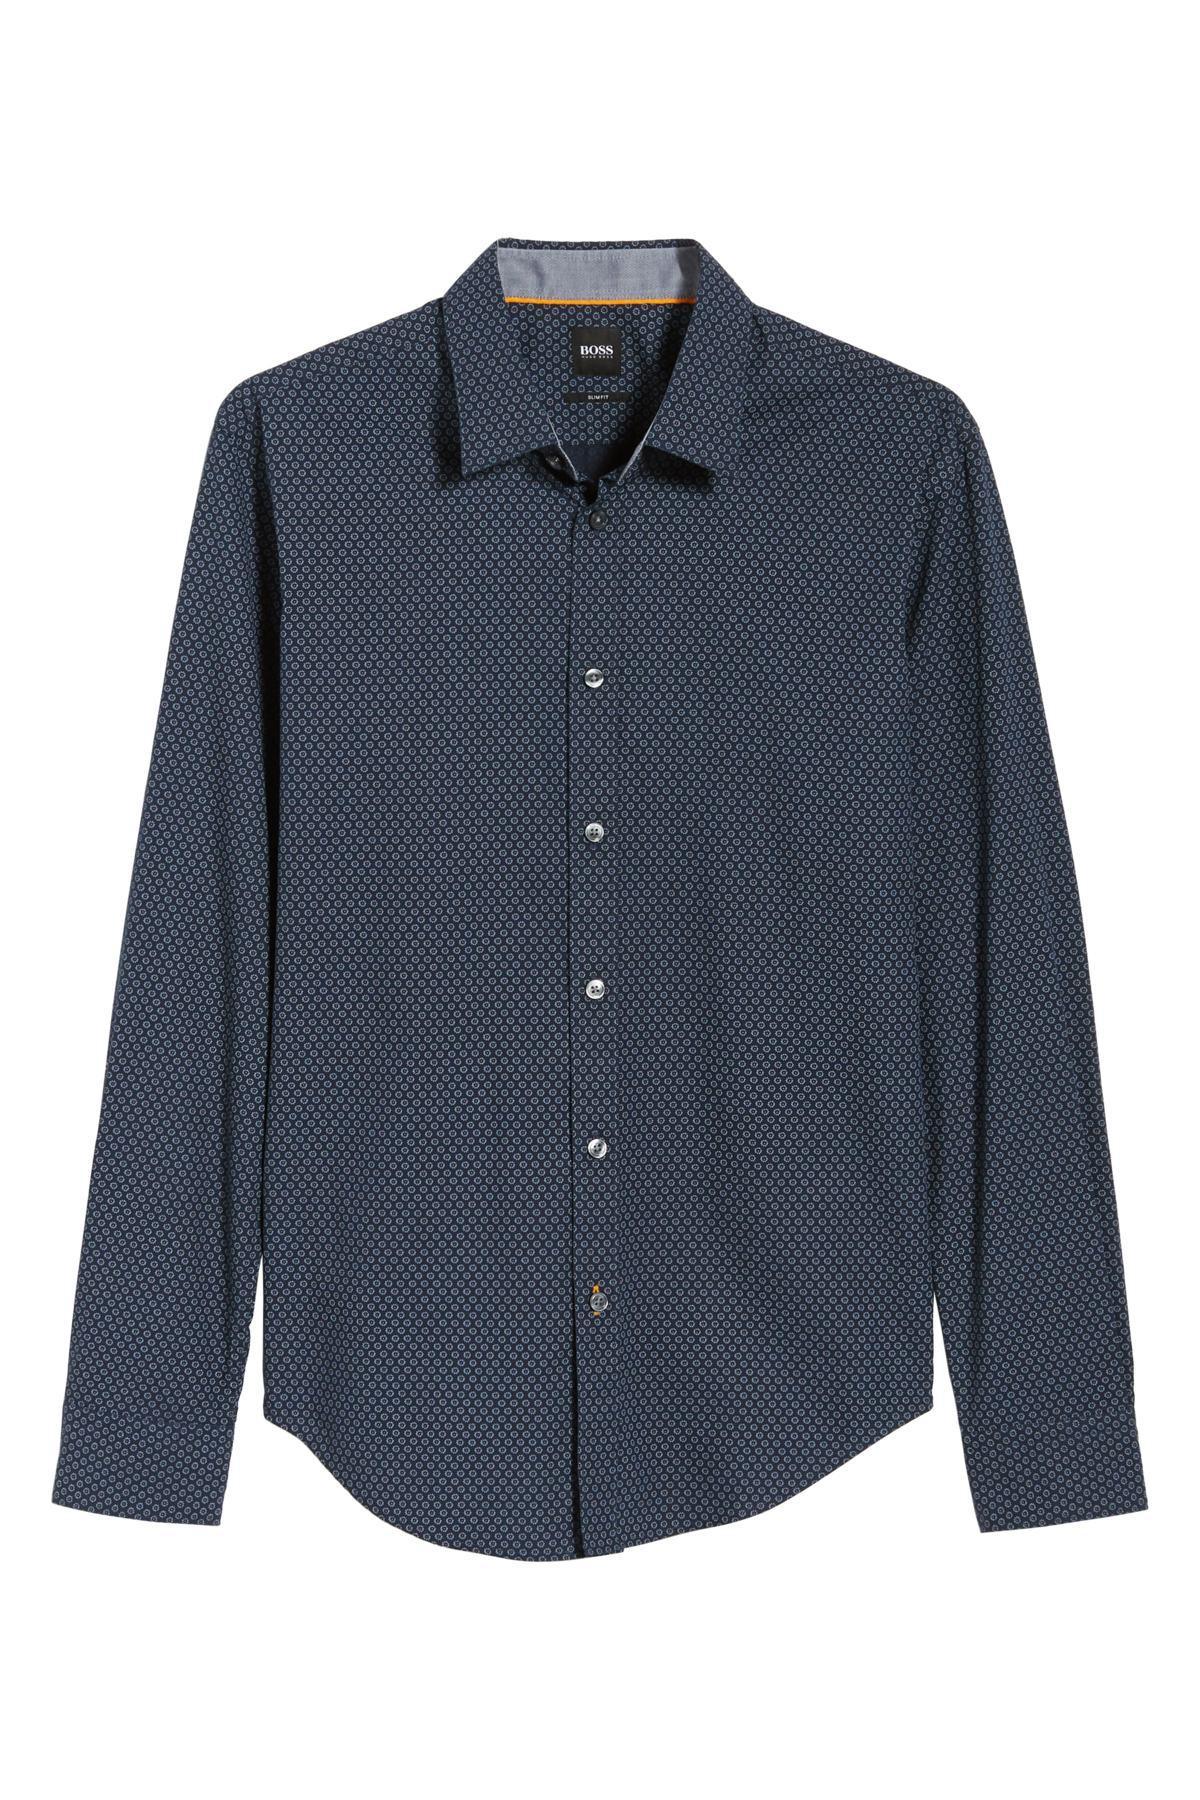 635139cd BOSS Ronni Slim Fit Micro Print Sport Shirt in Blue for Men - Lyst